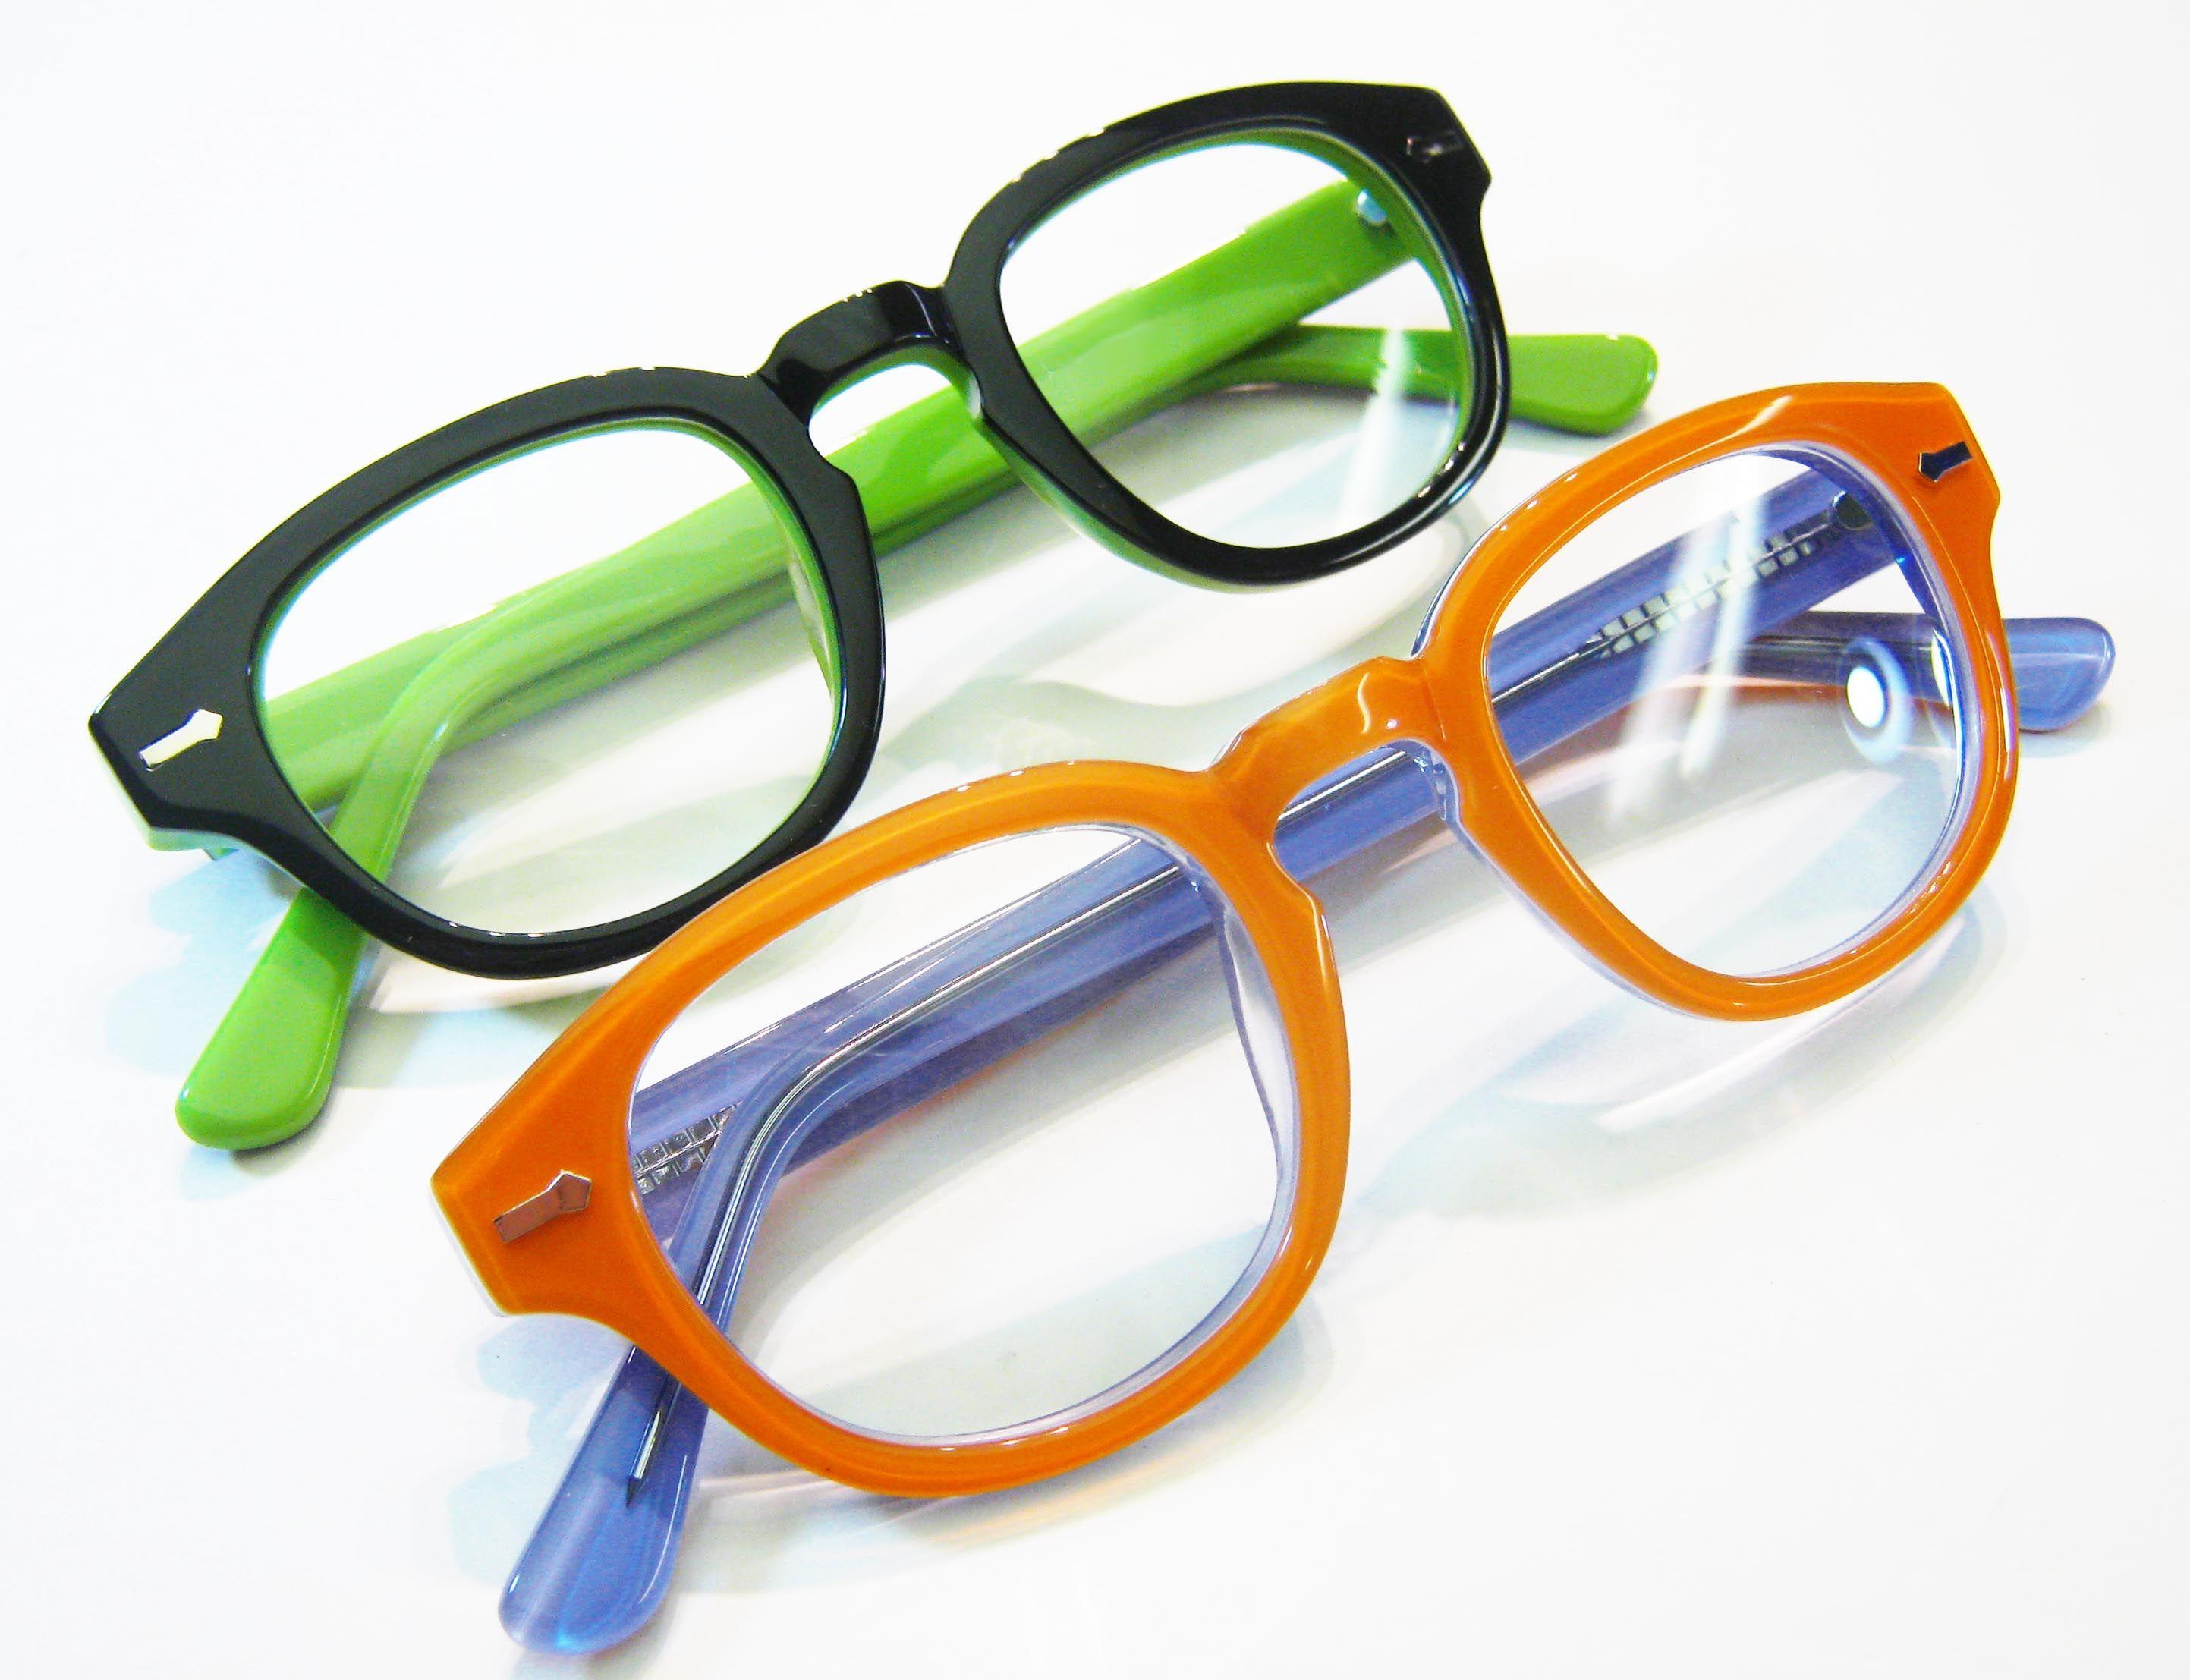 2tone reading glasses in hard to resist colors. Black or Orange ...